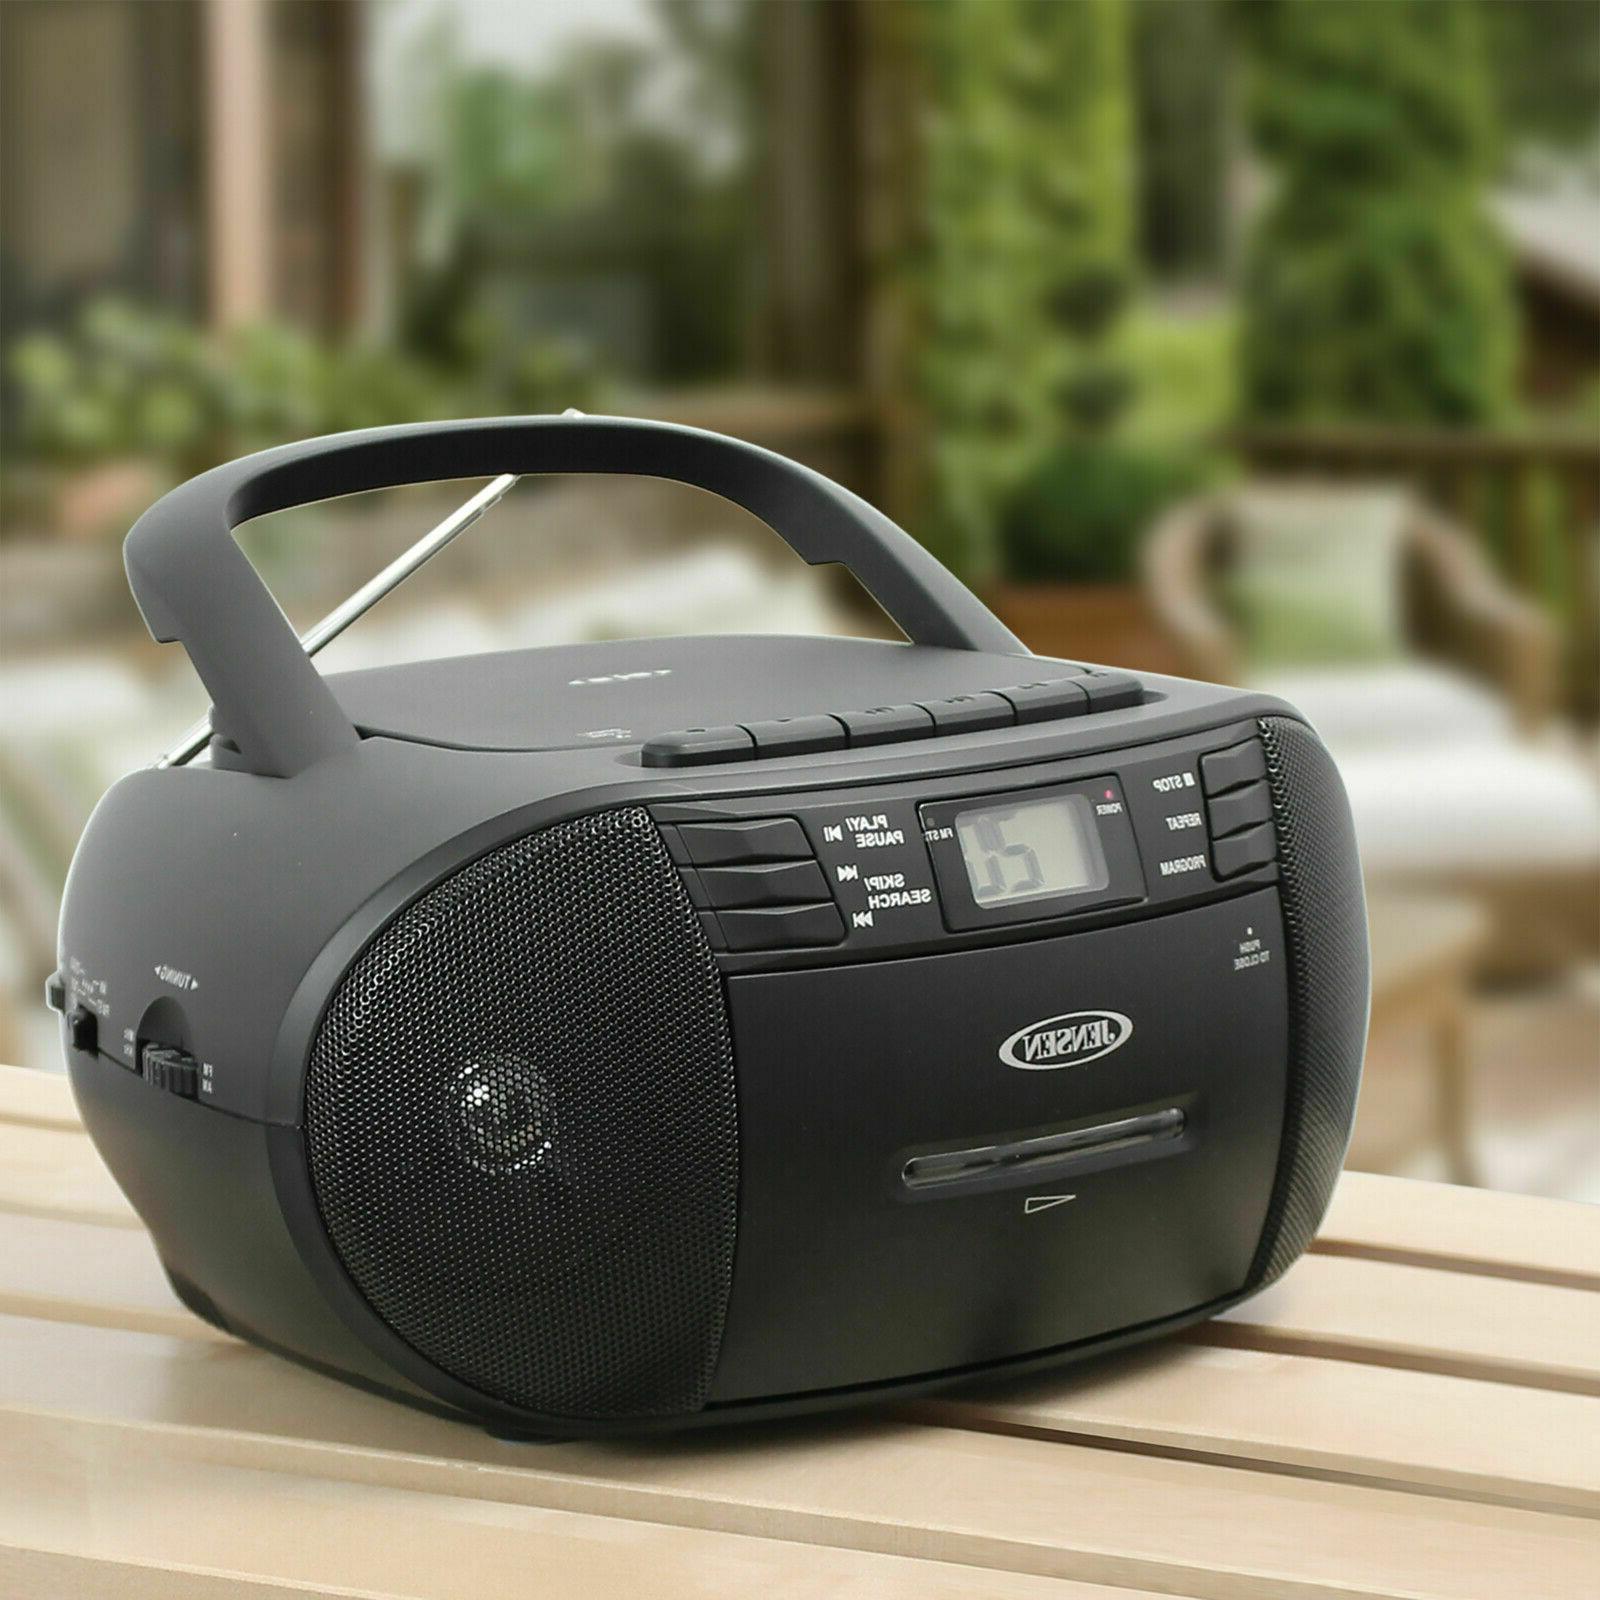 JENSEN CD-545 Recorder Player